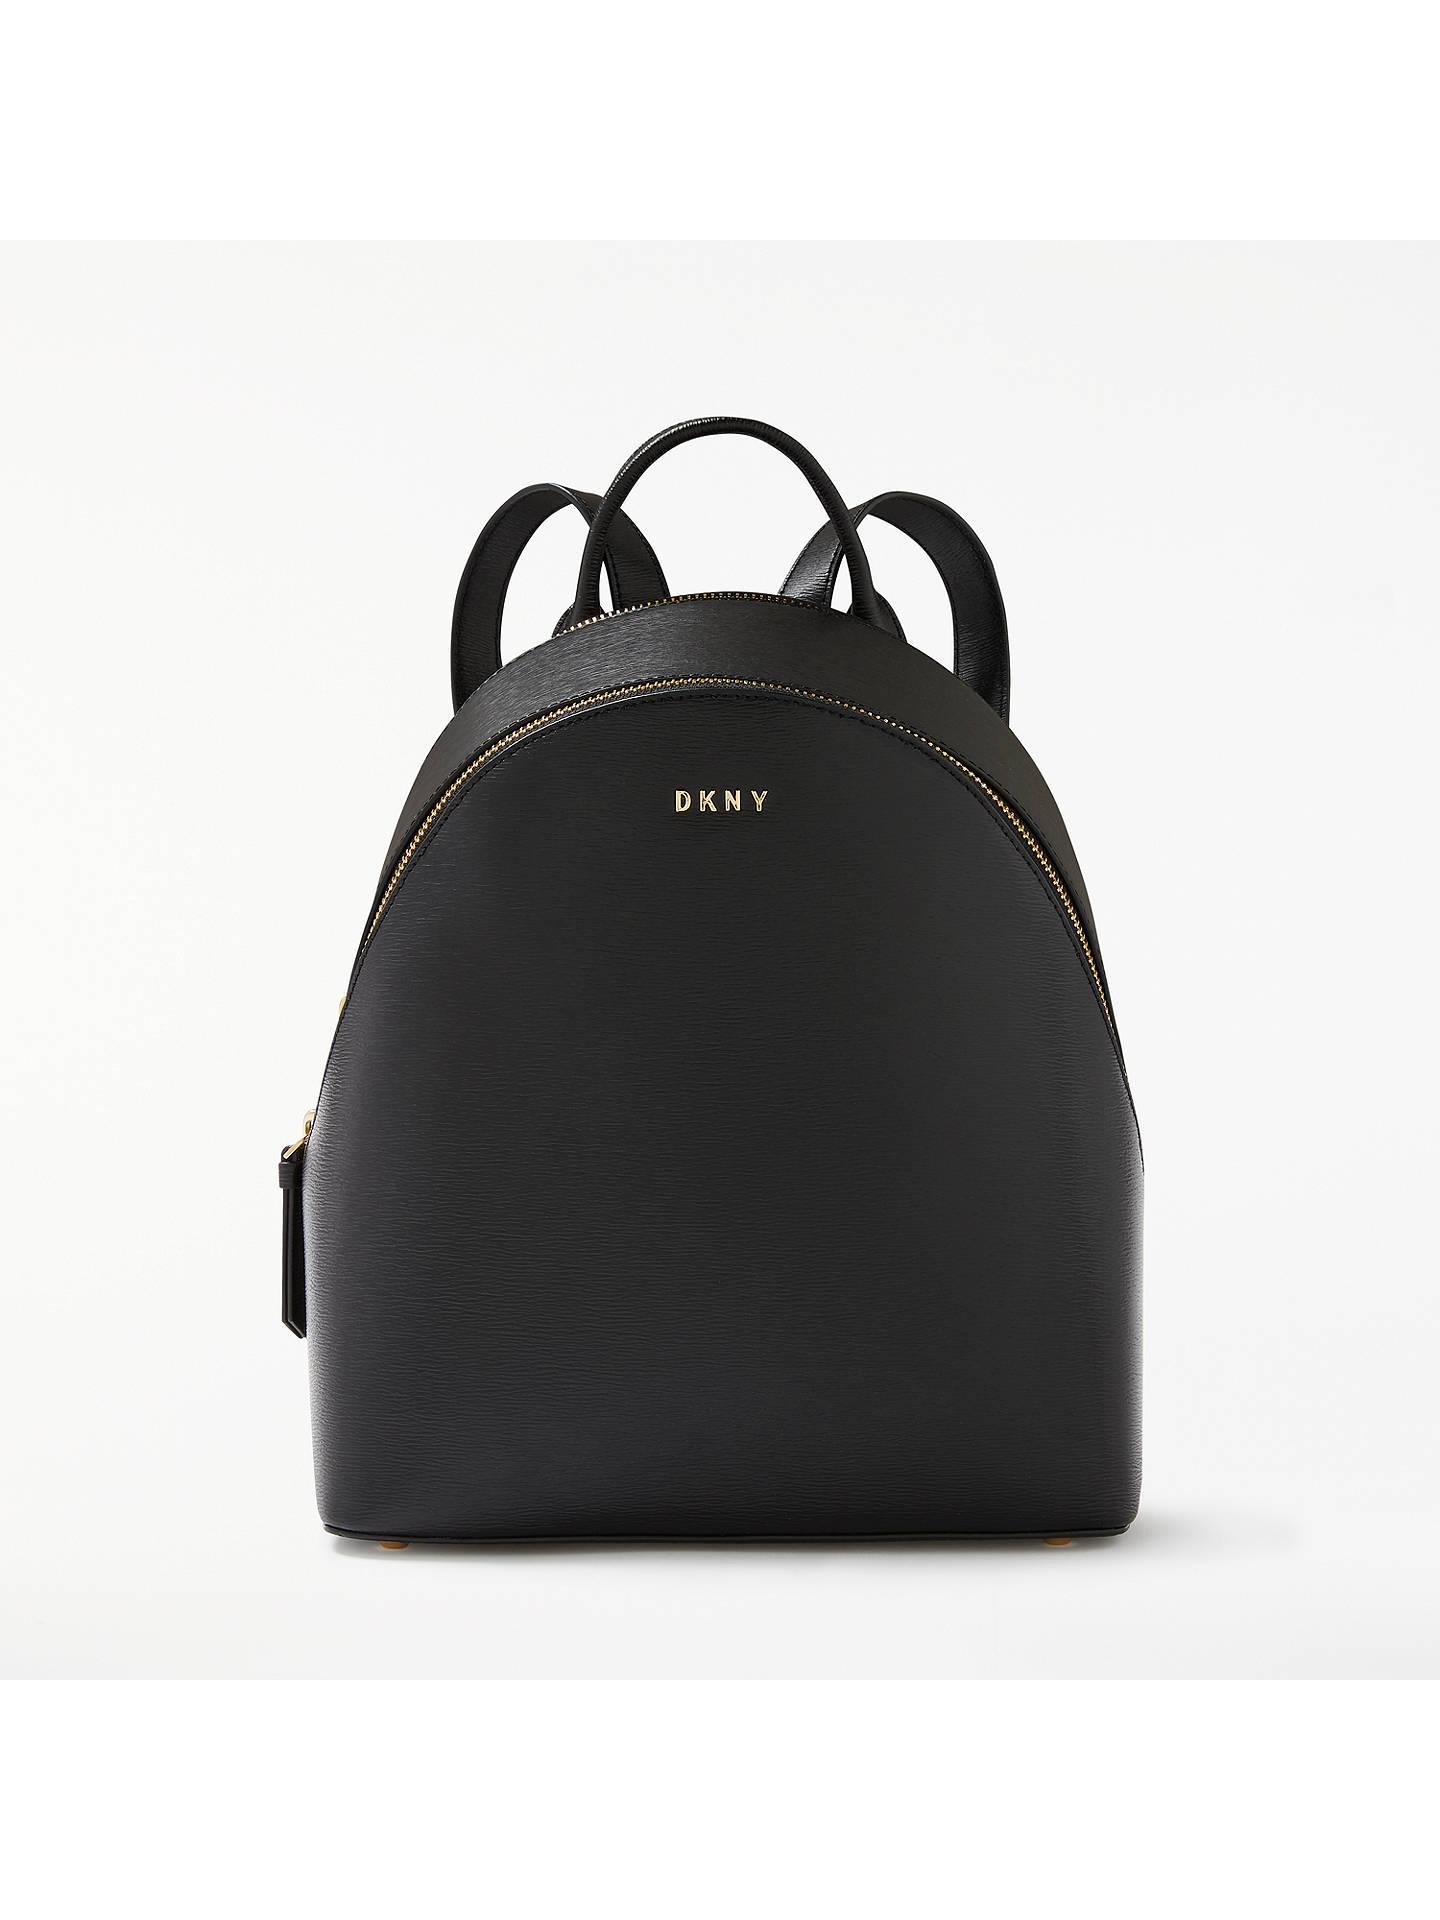 Black Backpack Leather Purse- Fenix Toulouse Handball beb29e33d54d1